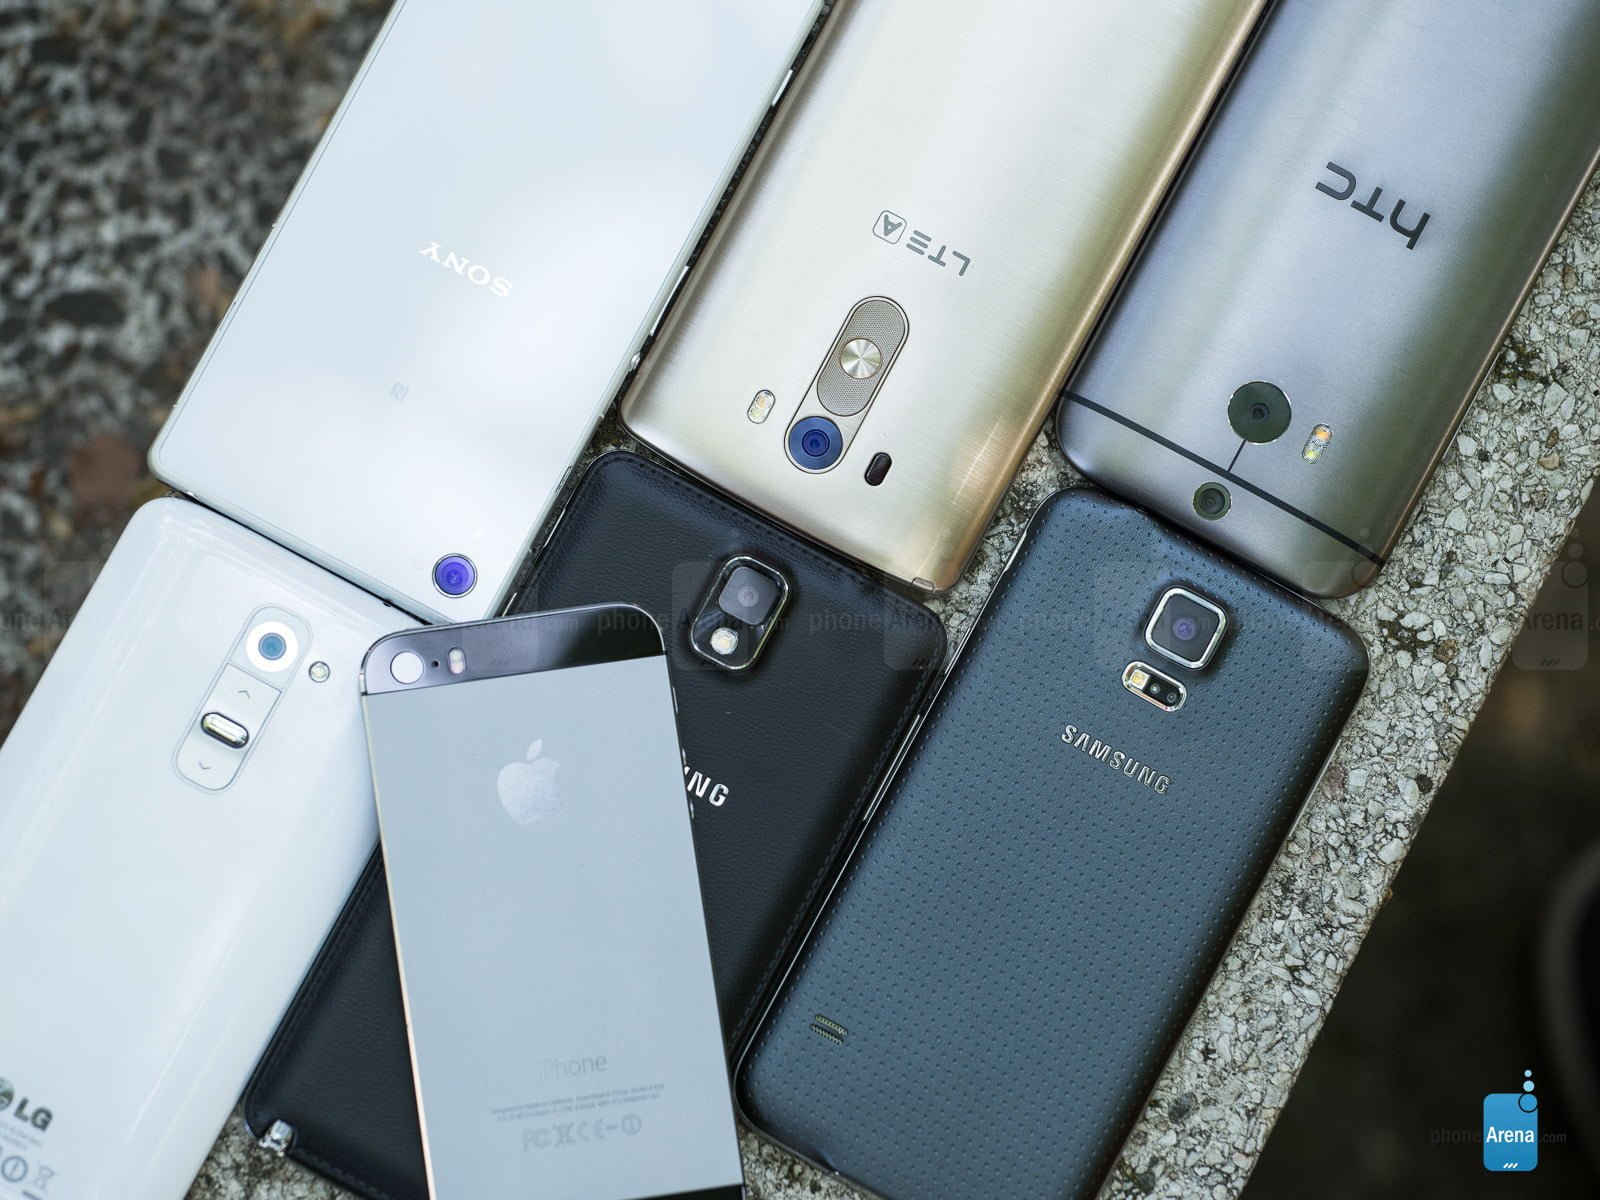 LG G3, Samsung Galaxy S5, Galaxy Note 3, iPhone 5s, LG G2, Sony Xperia Z2 oraz HTC One (M8) 3